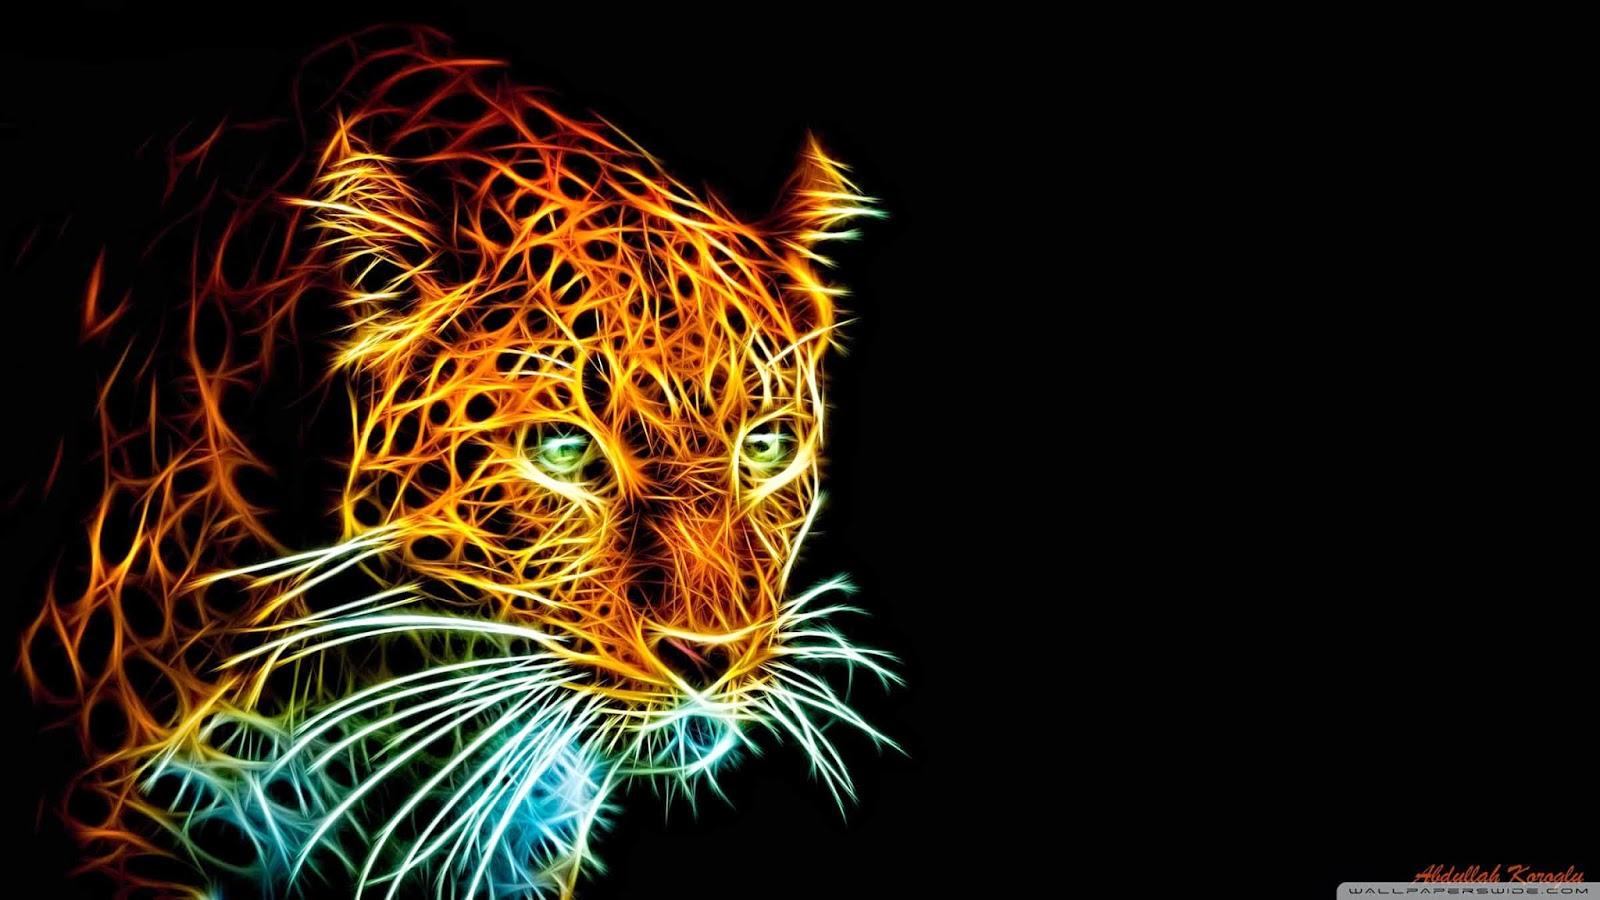 Terriod animals hd wallpapers - Animal black background wallpaper ...